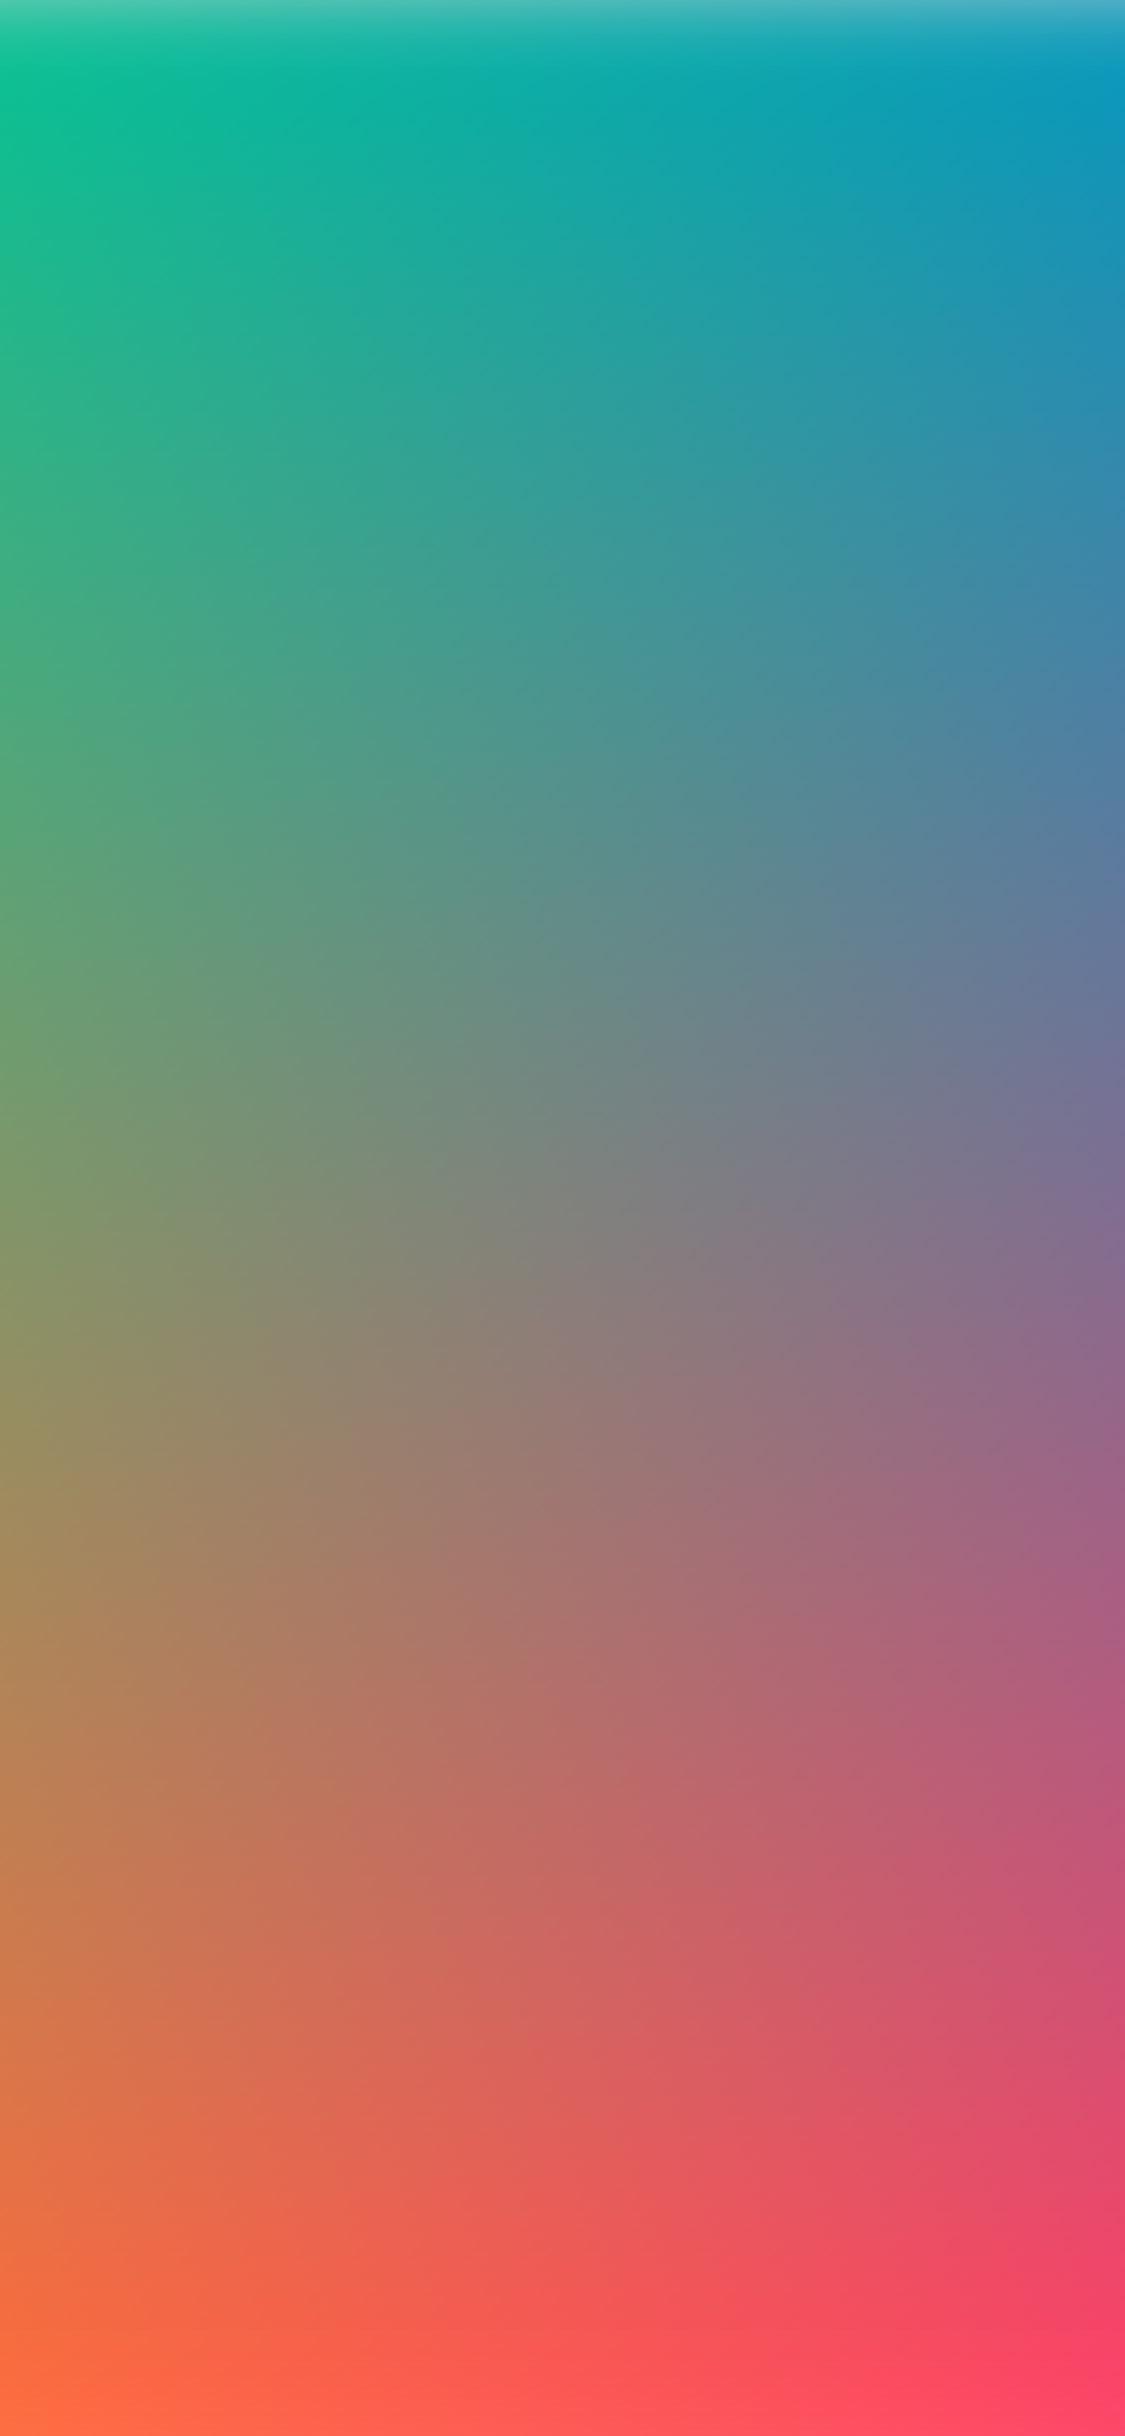 Sl86 Color Rainbow Blur Gradation Wallpaper